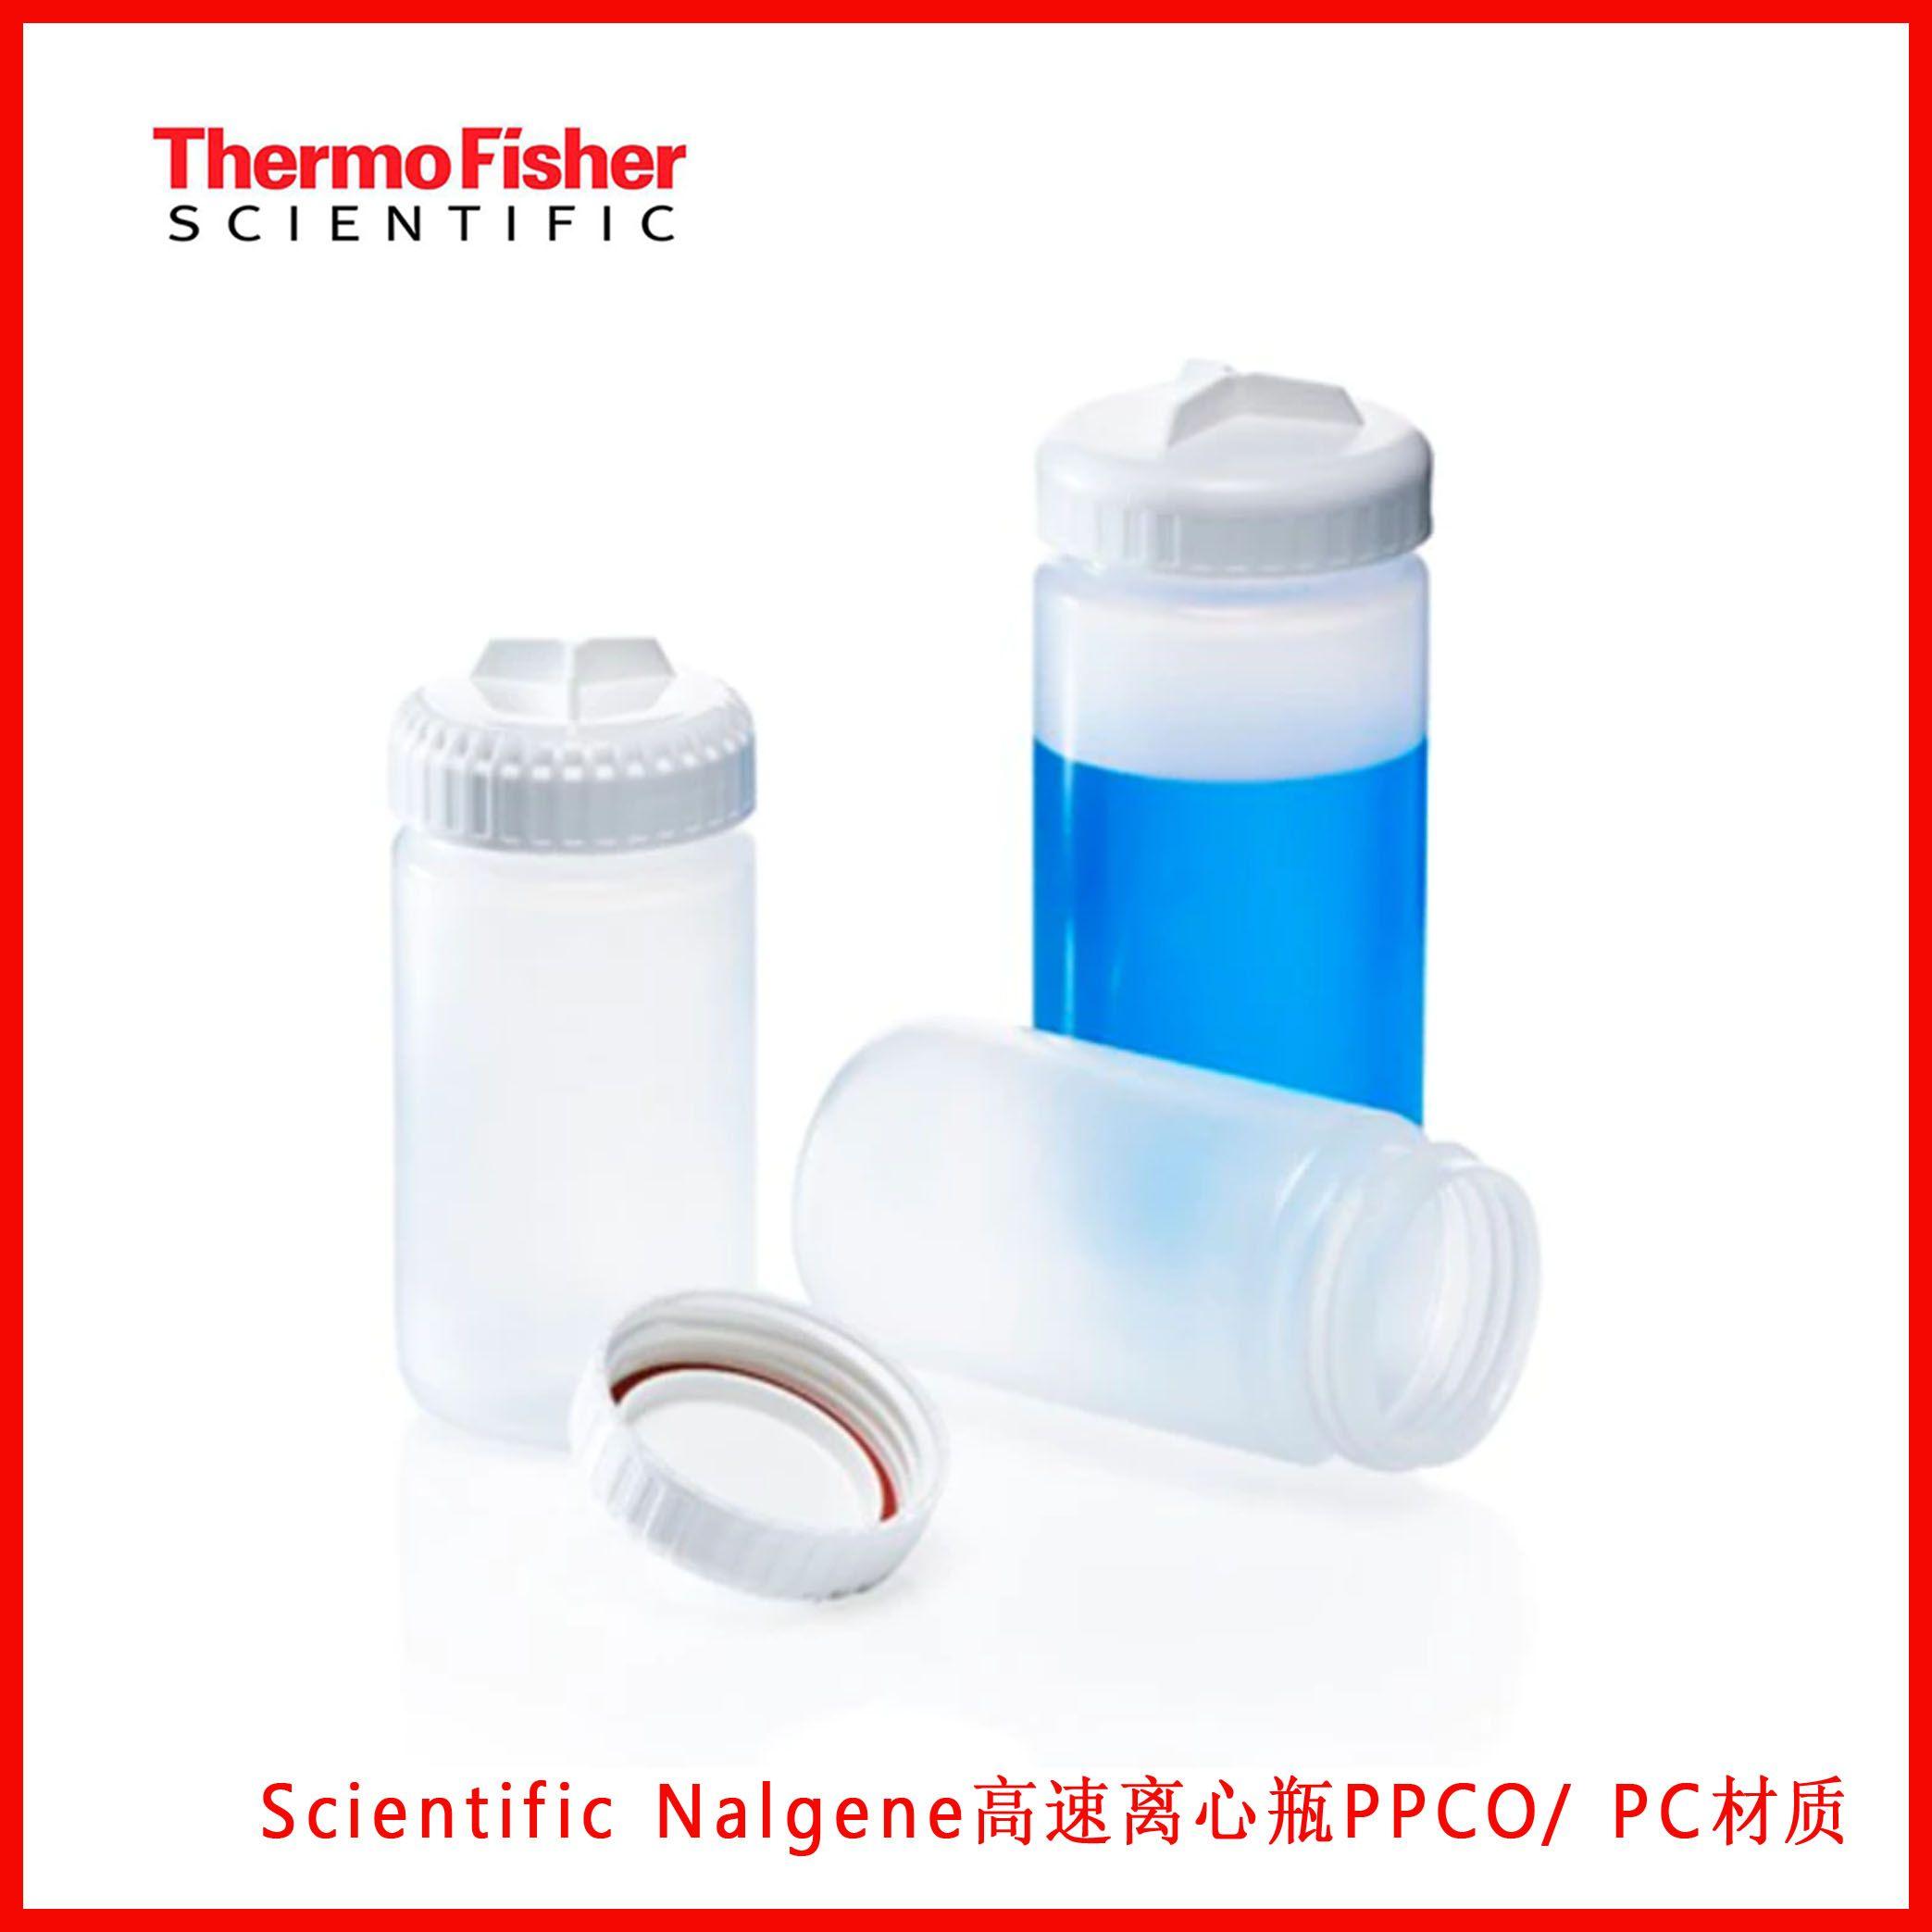 Thermo Scientific Nalgene高速离心瓶PPCO/ PC材质,现货